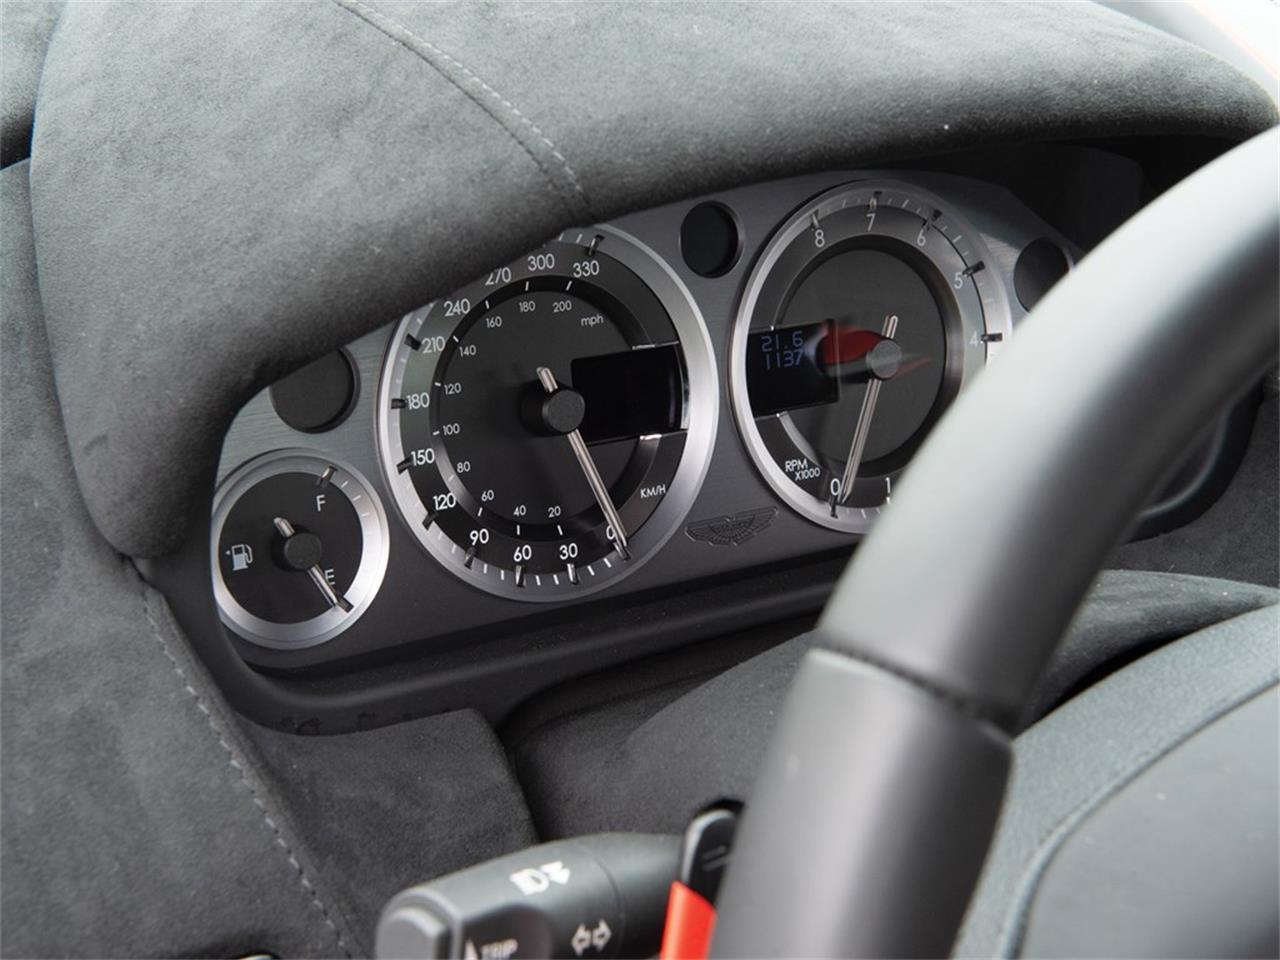 2017 Aston Martin V8 Vantage (CC-1259244) for sale in Monteira,